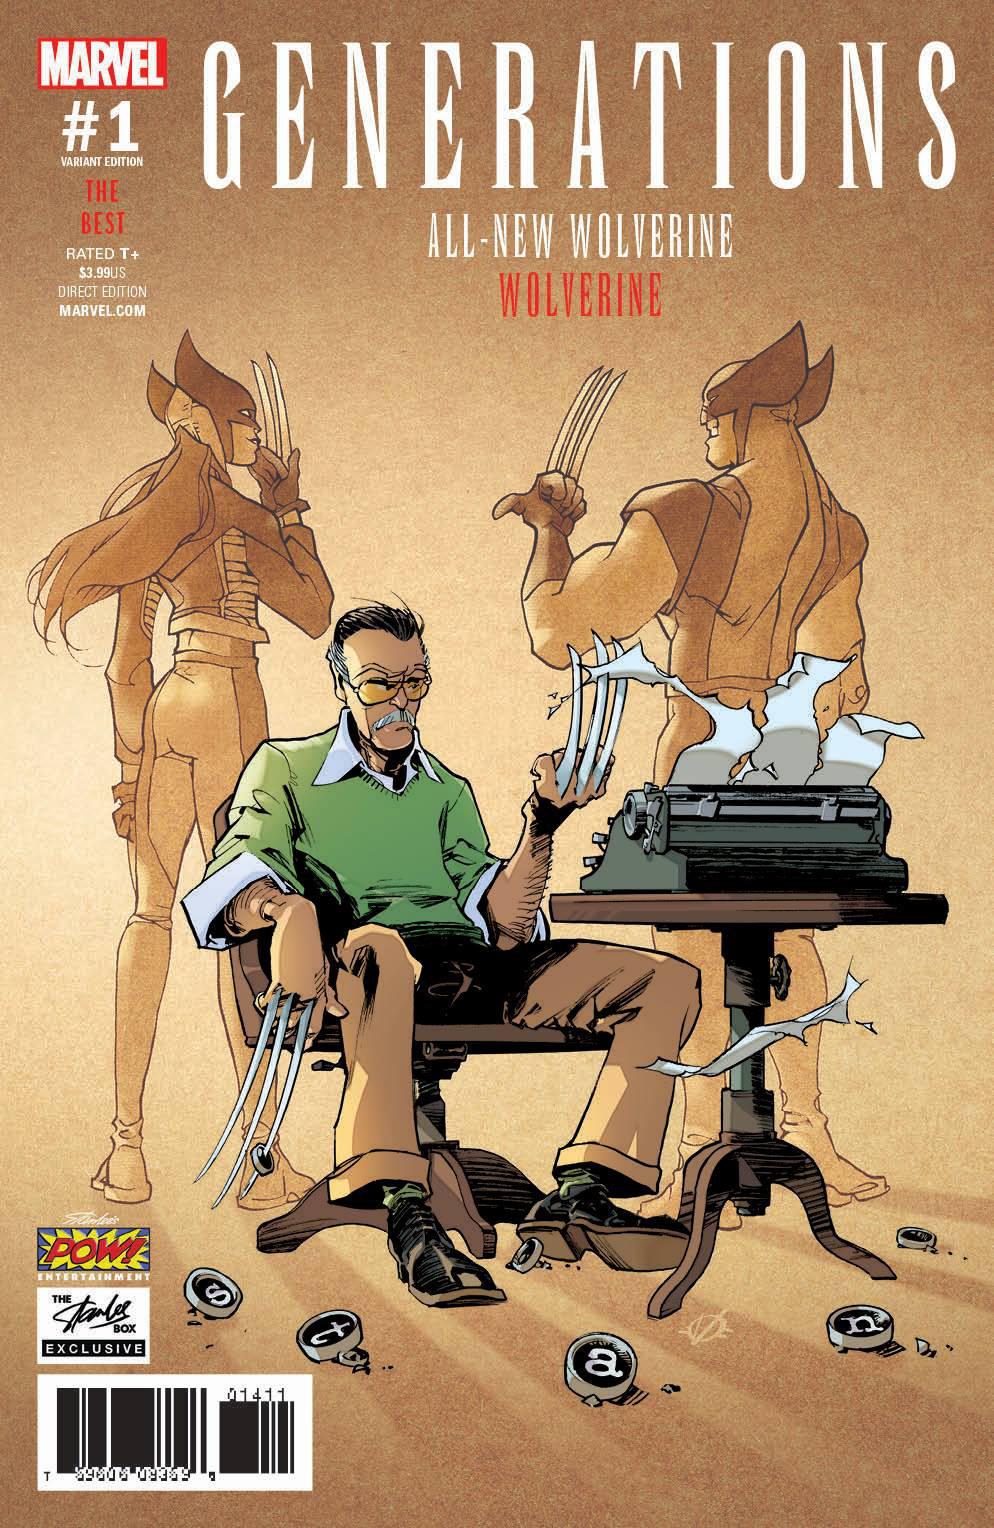 Stan Lee's Comic Box Cover by lao-wa